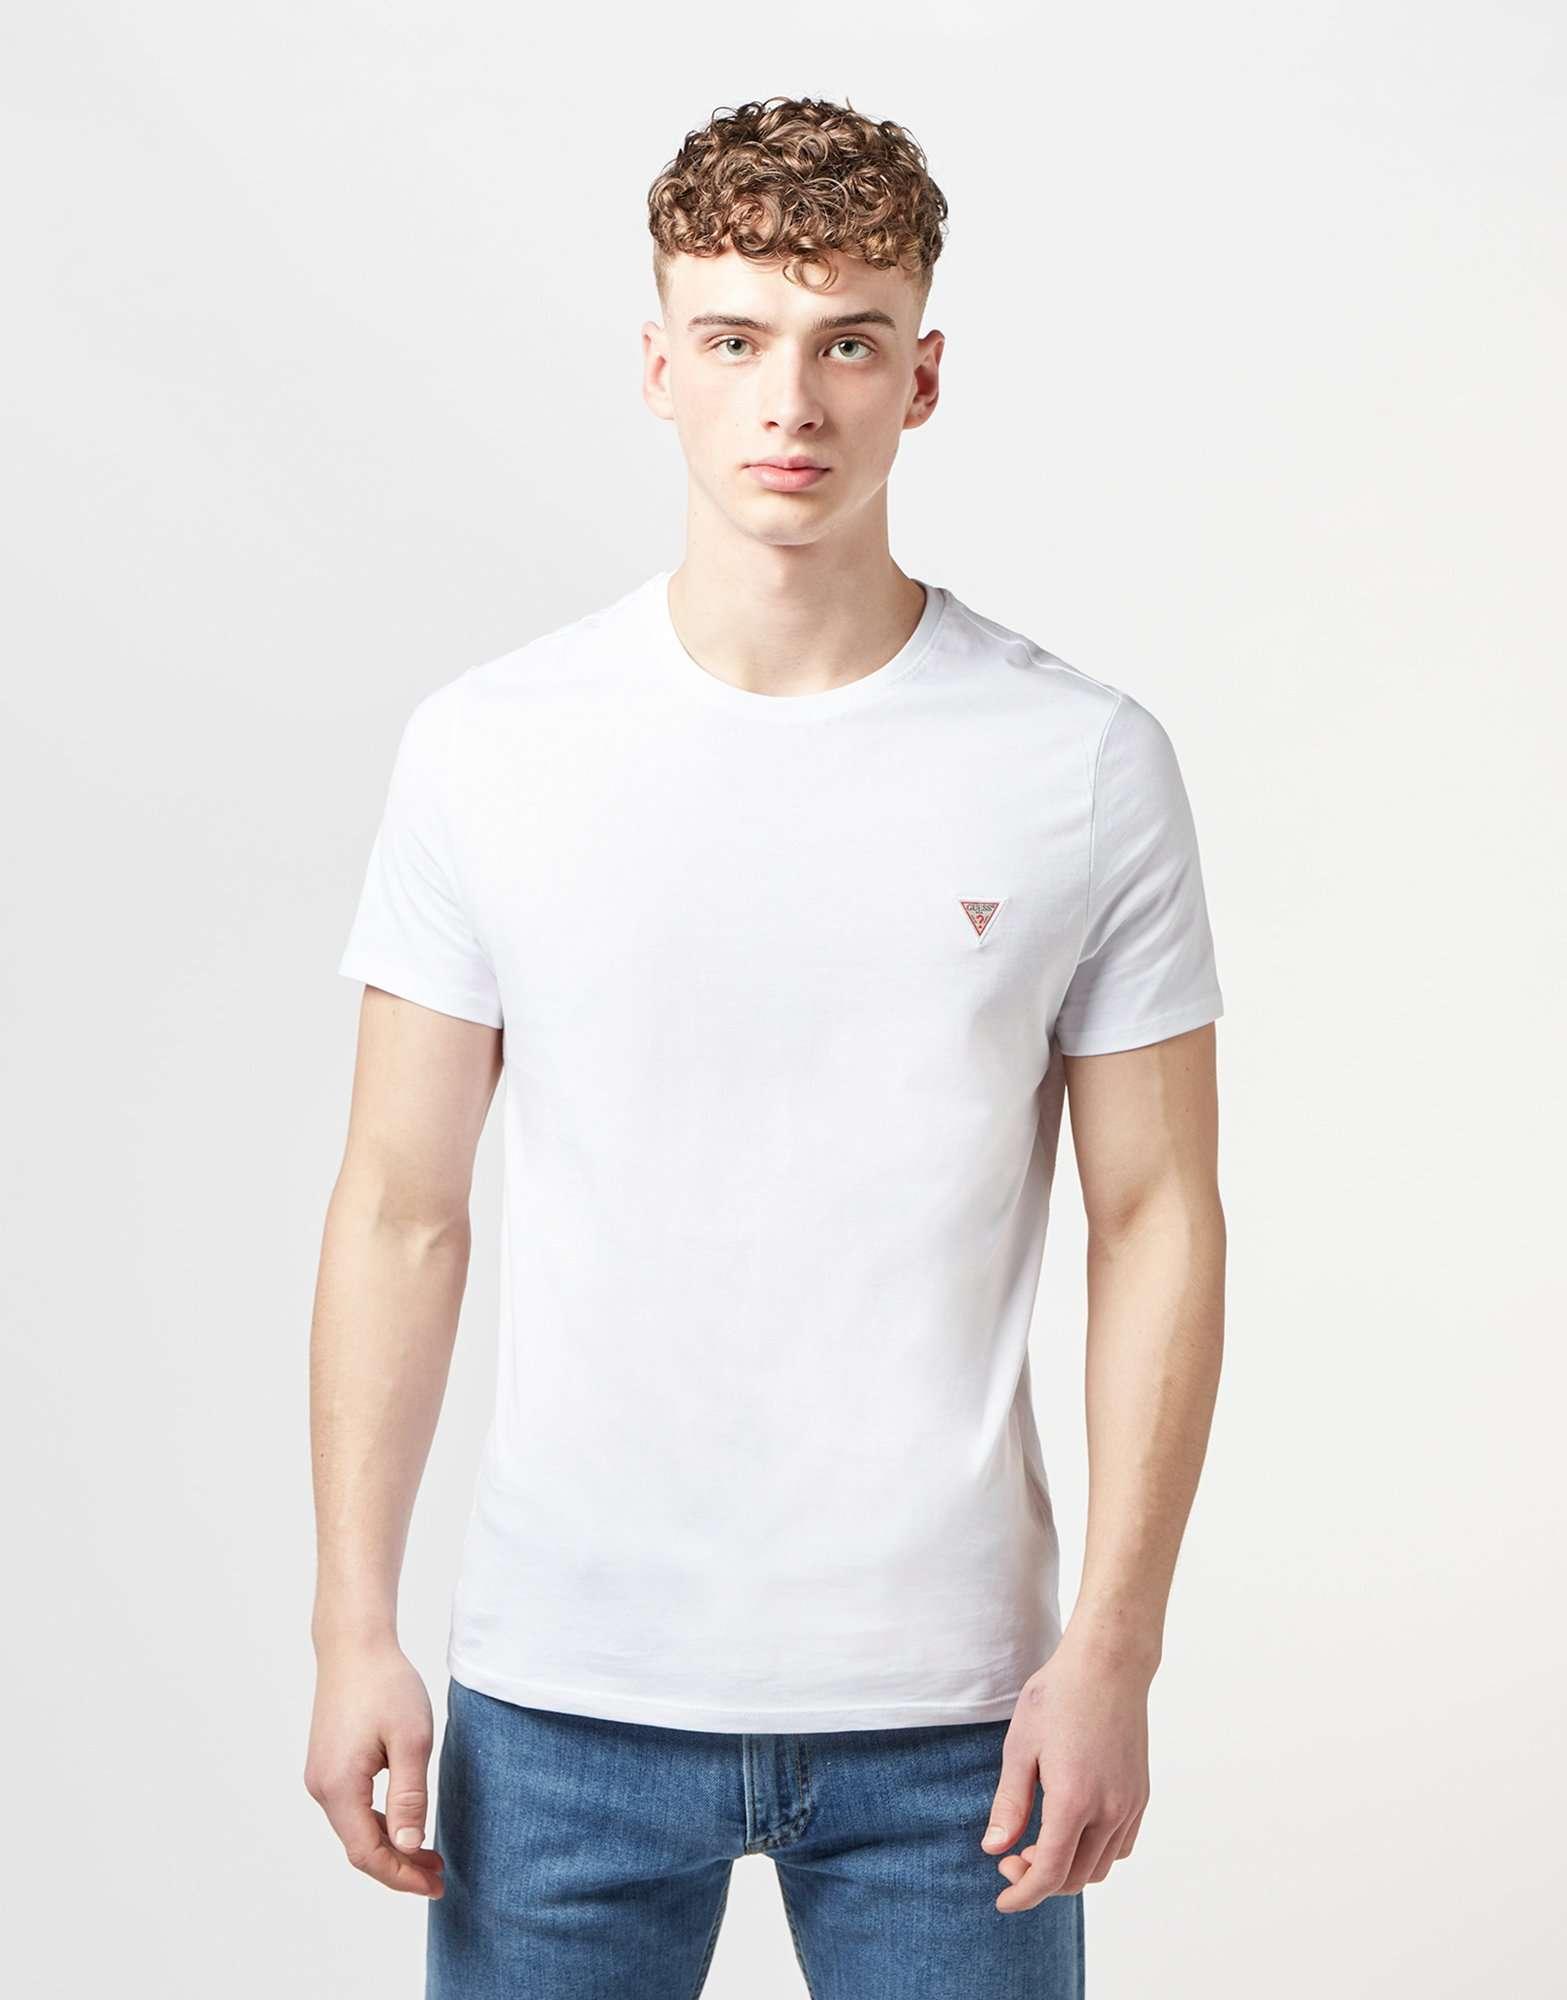 Guess Core Short Sleeve T-Shirt - Online Exclusive